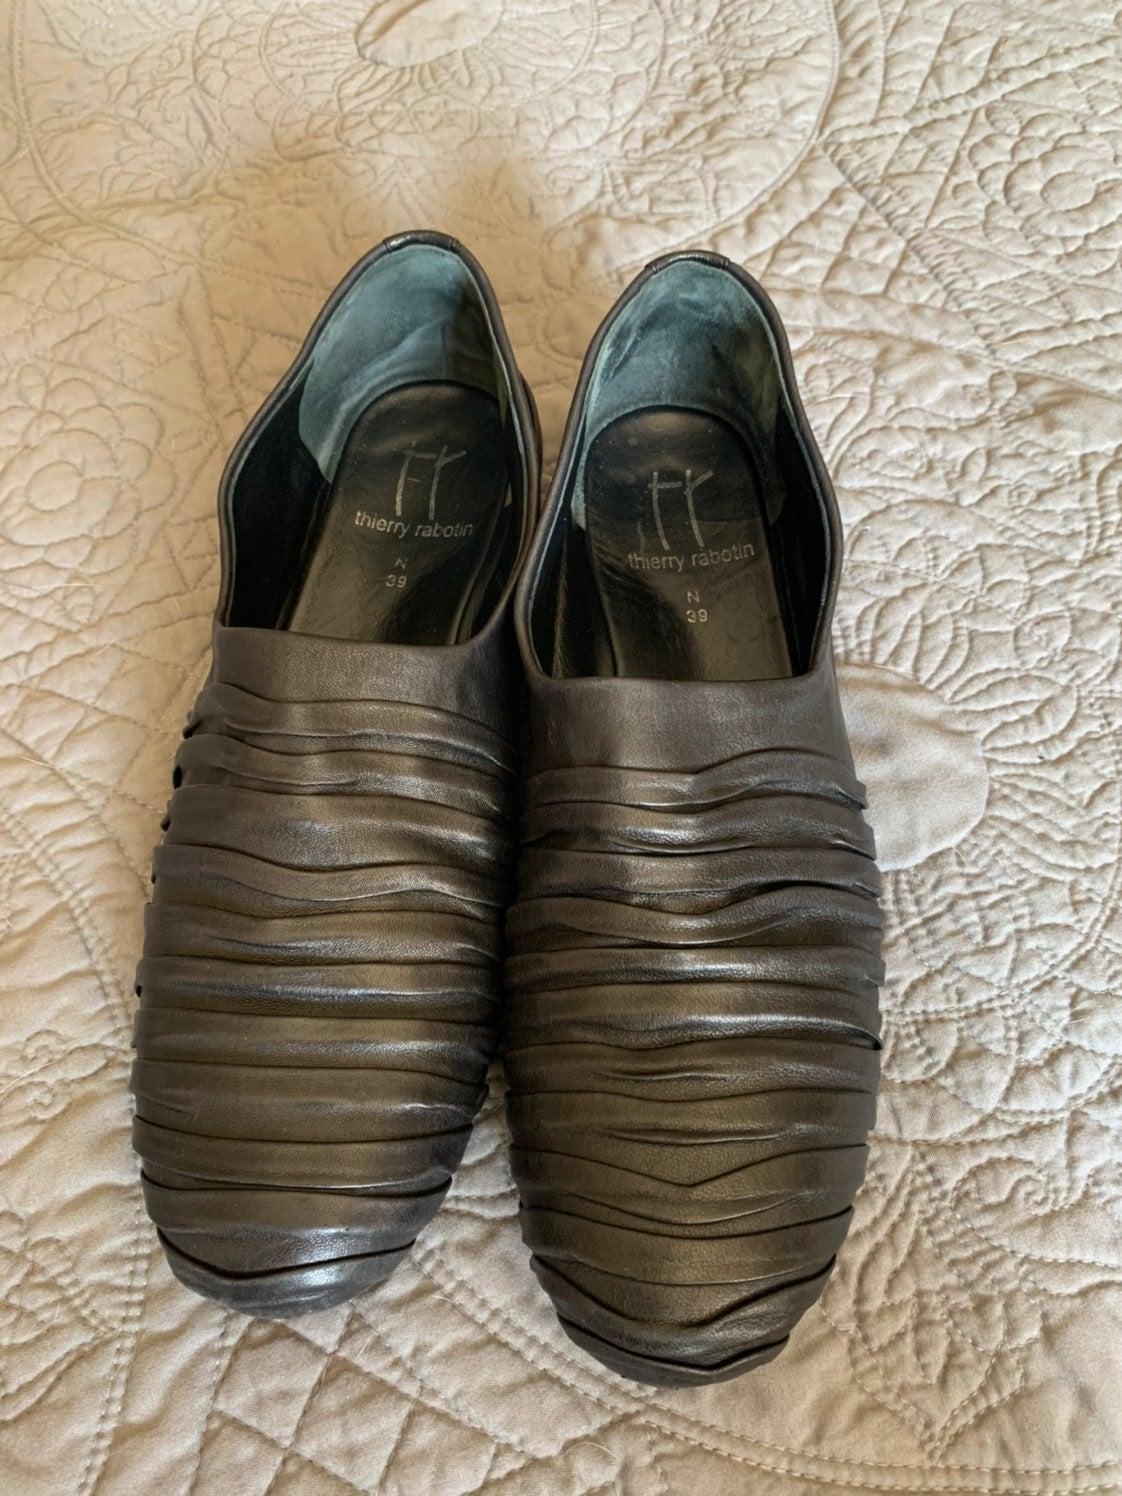 Thierry Rabotin black leather shoes